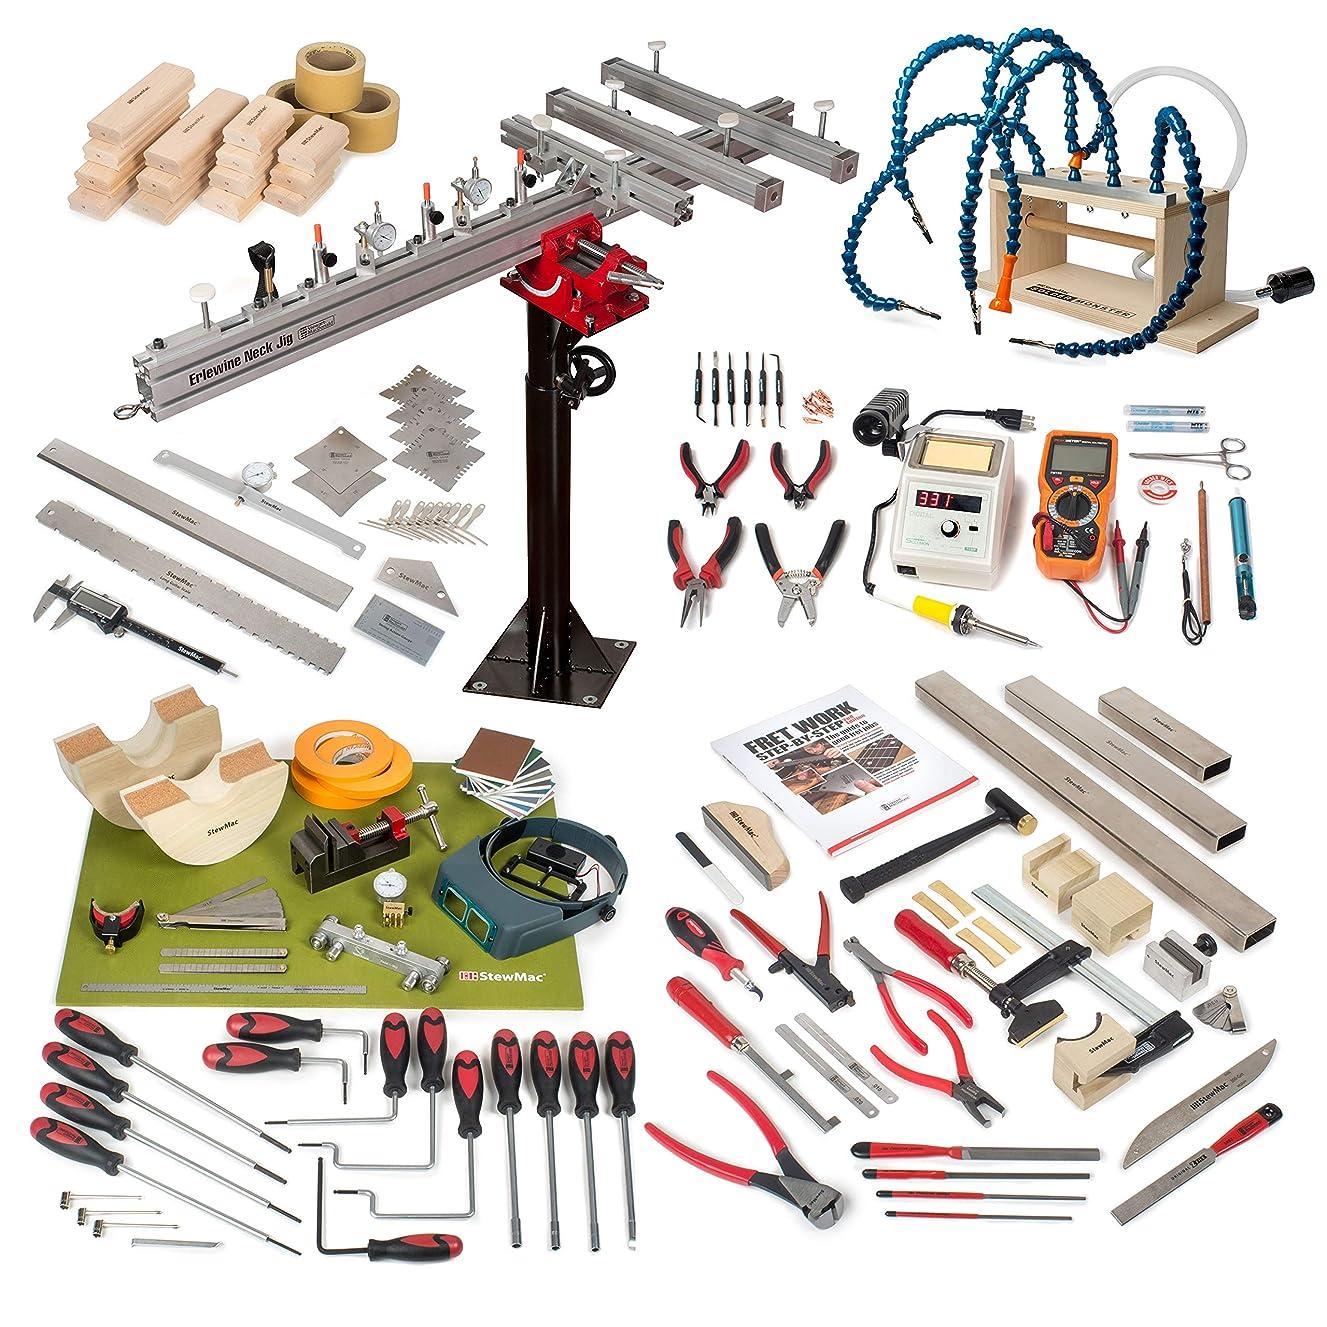 StewMac Guitar Shop Master Tool Set